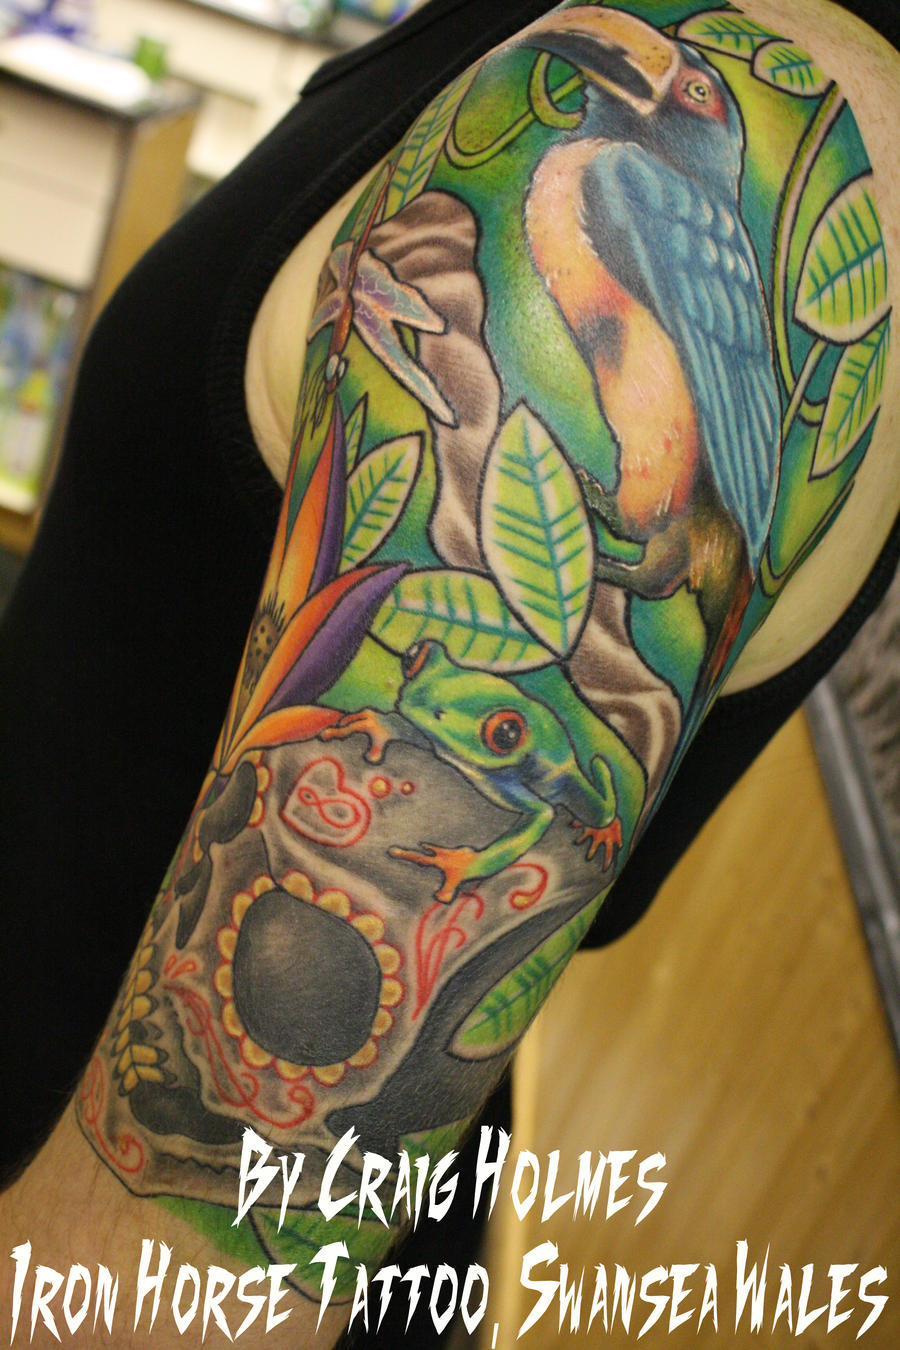 Colorful Sugar Skull Tattoo Rainforest tattoo sleeve with